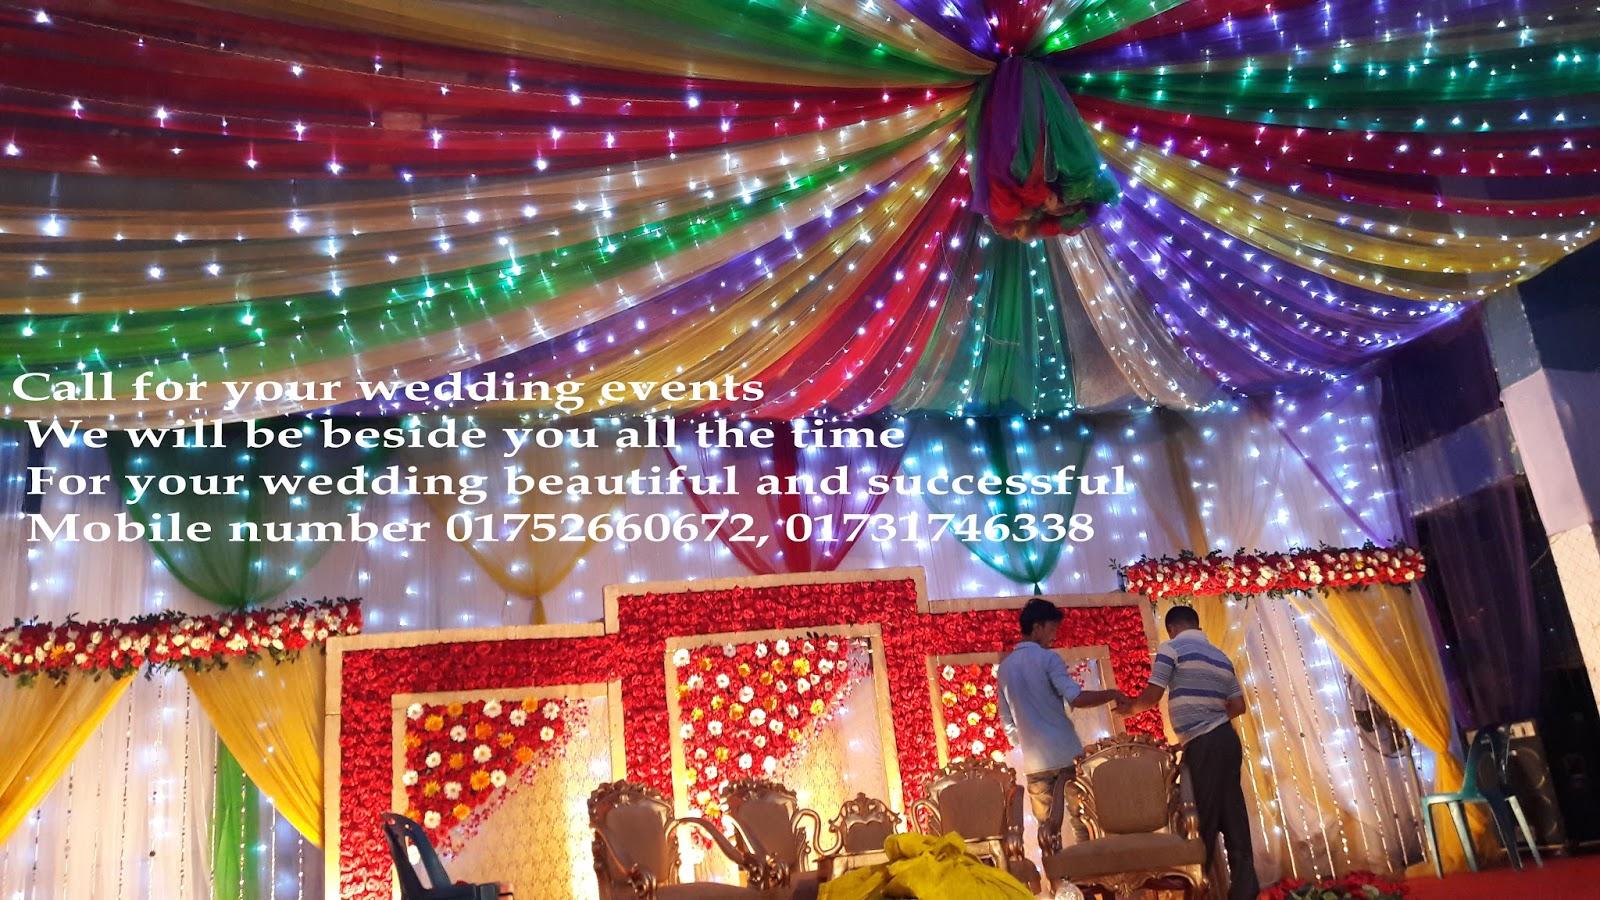 Ceiling pandal decor wedding management altavistaventures Image collections